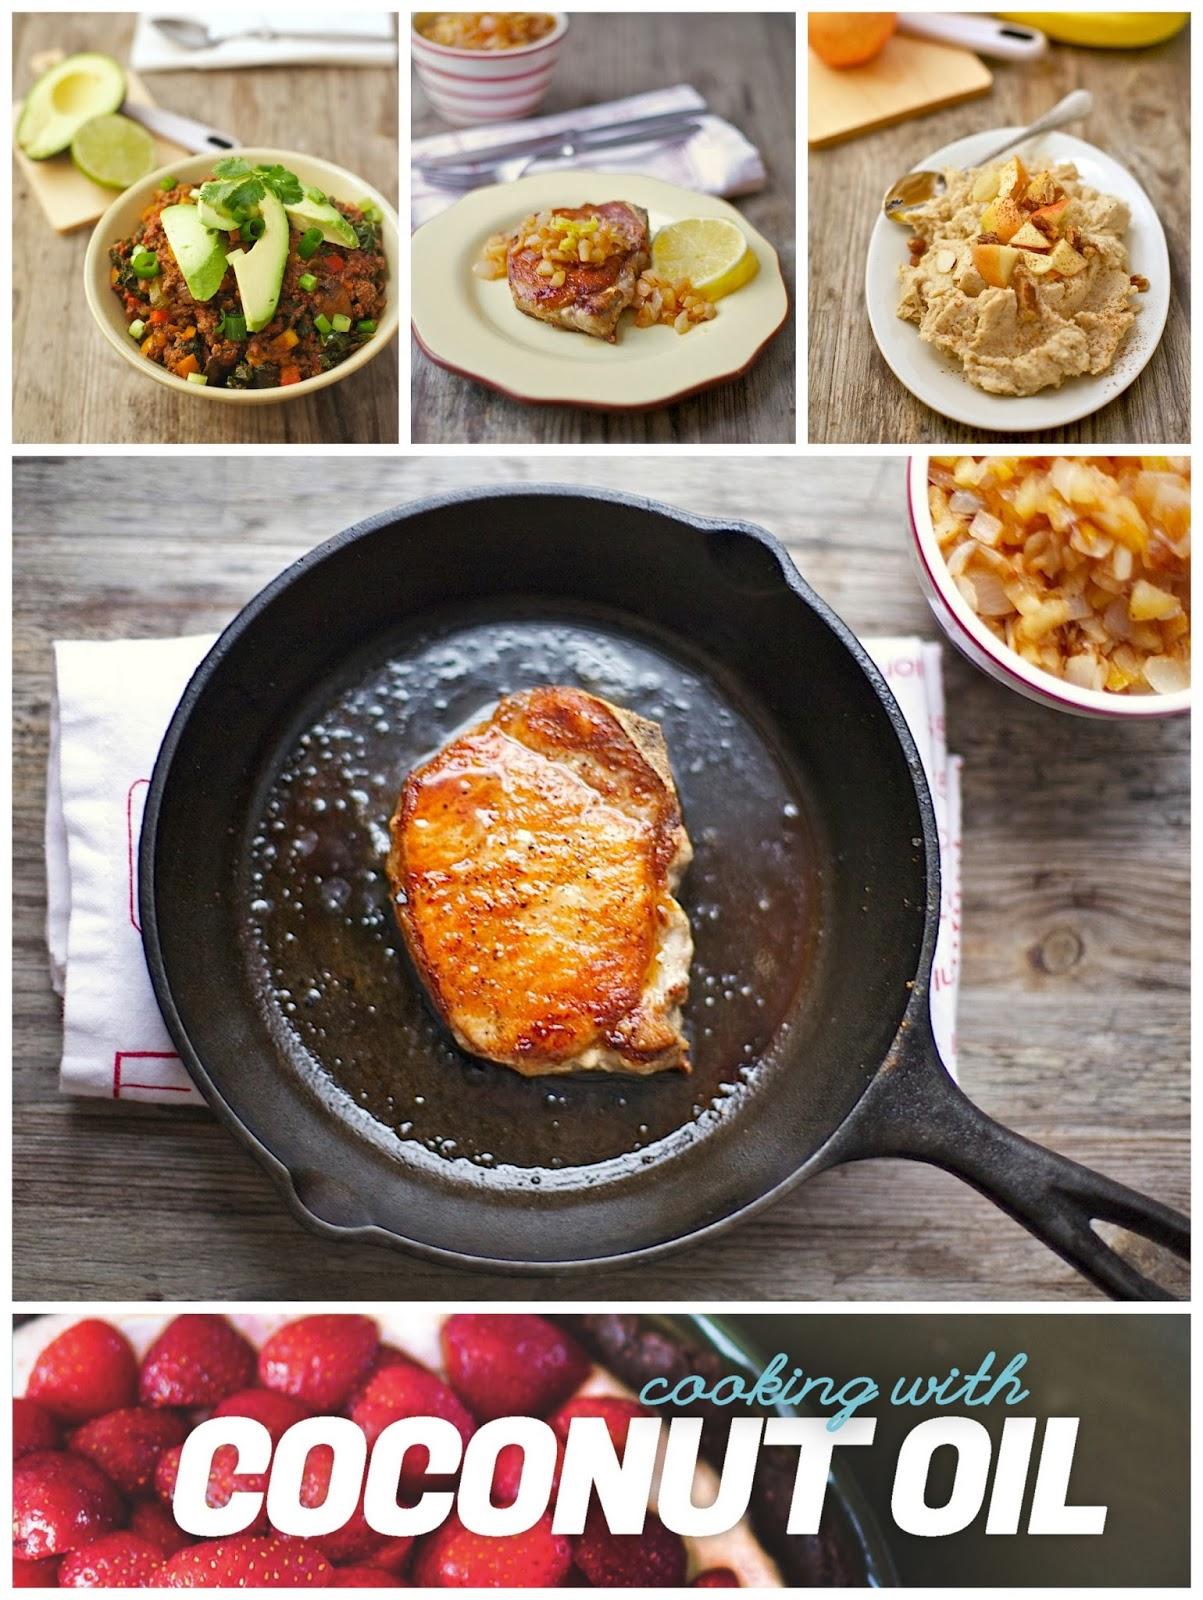 Pork Chops & Apple Compote (Gluten free, Paleo, Whole30)